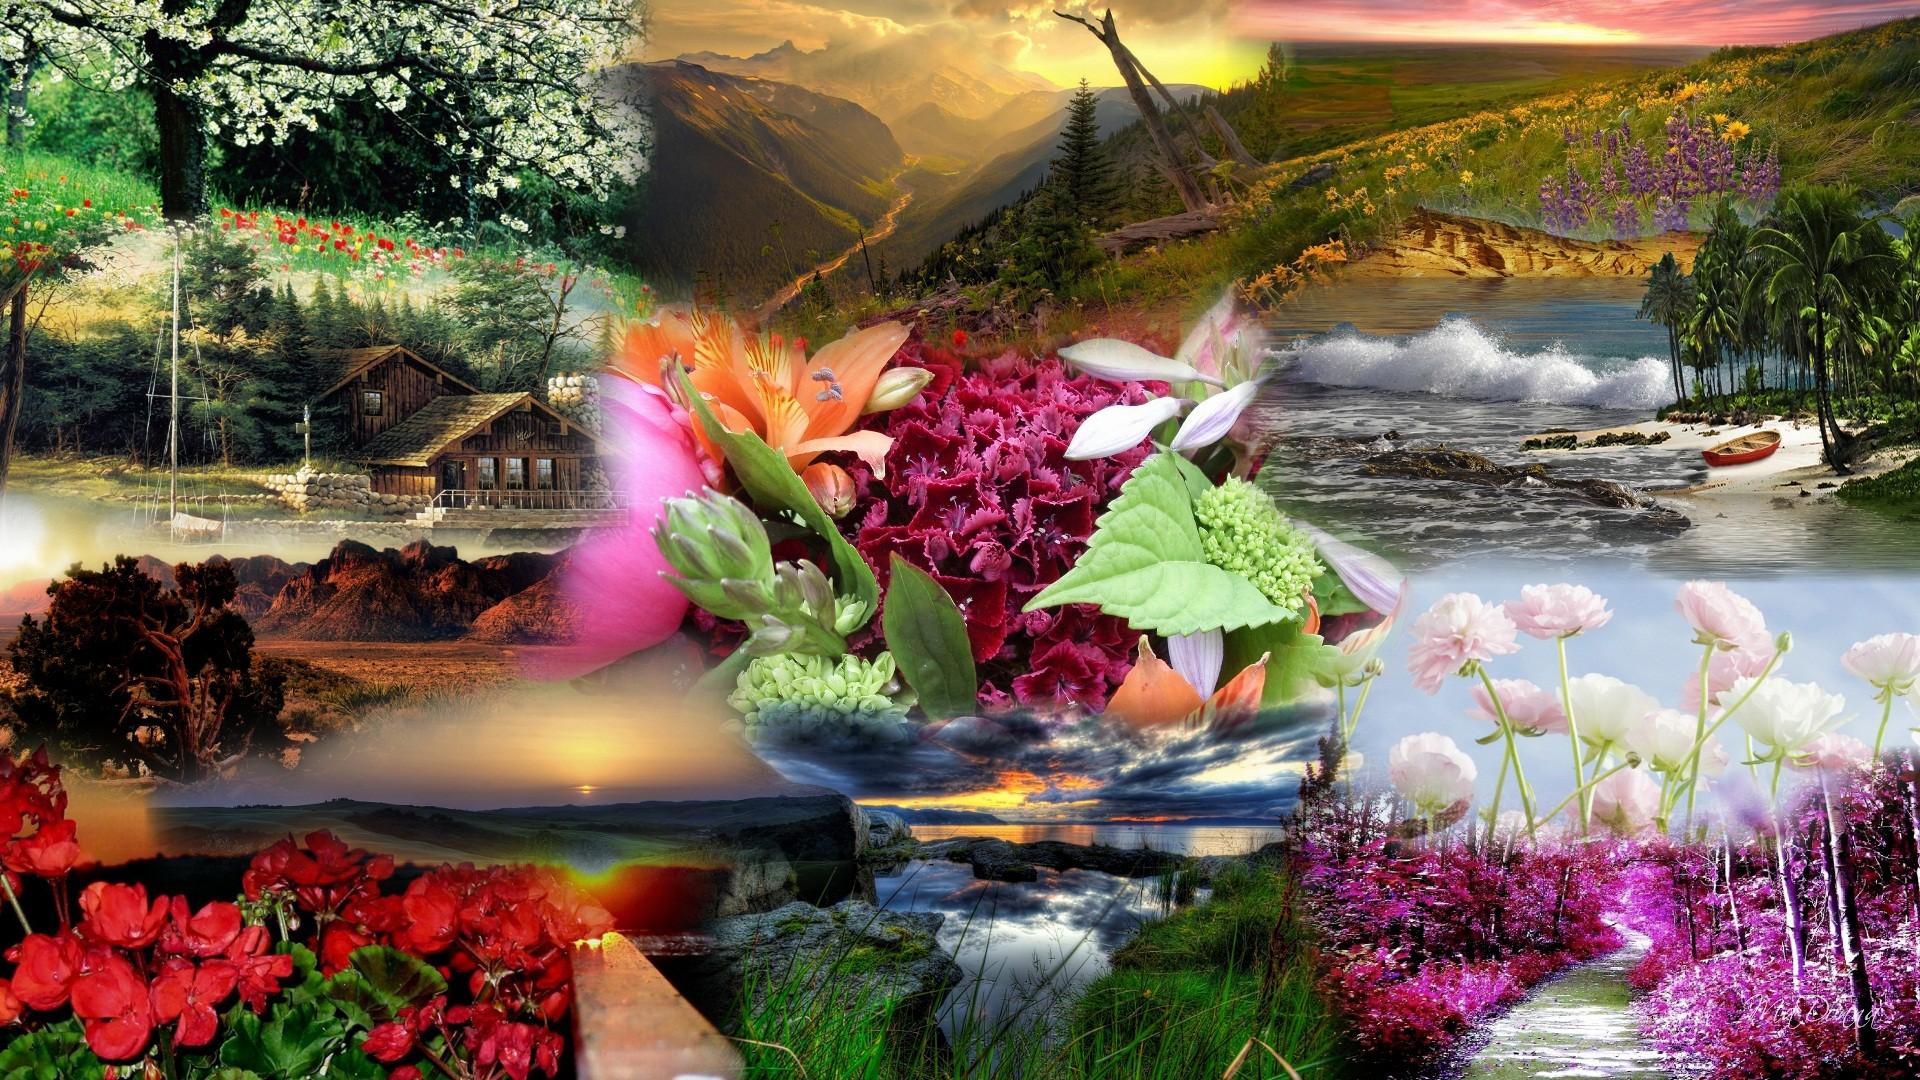 Beautiful Nature Wallpaper | Latest Hd Wallpapers